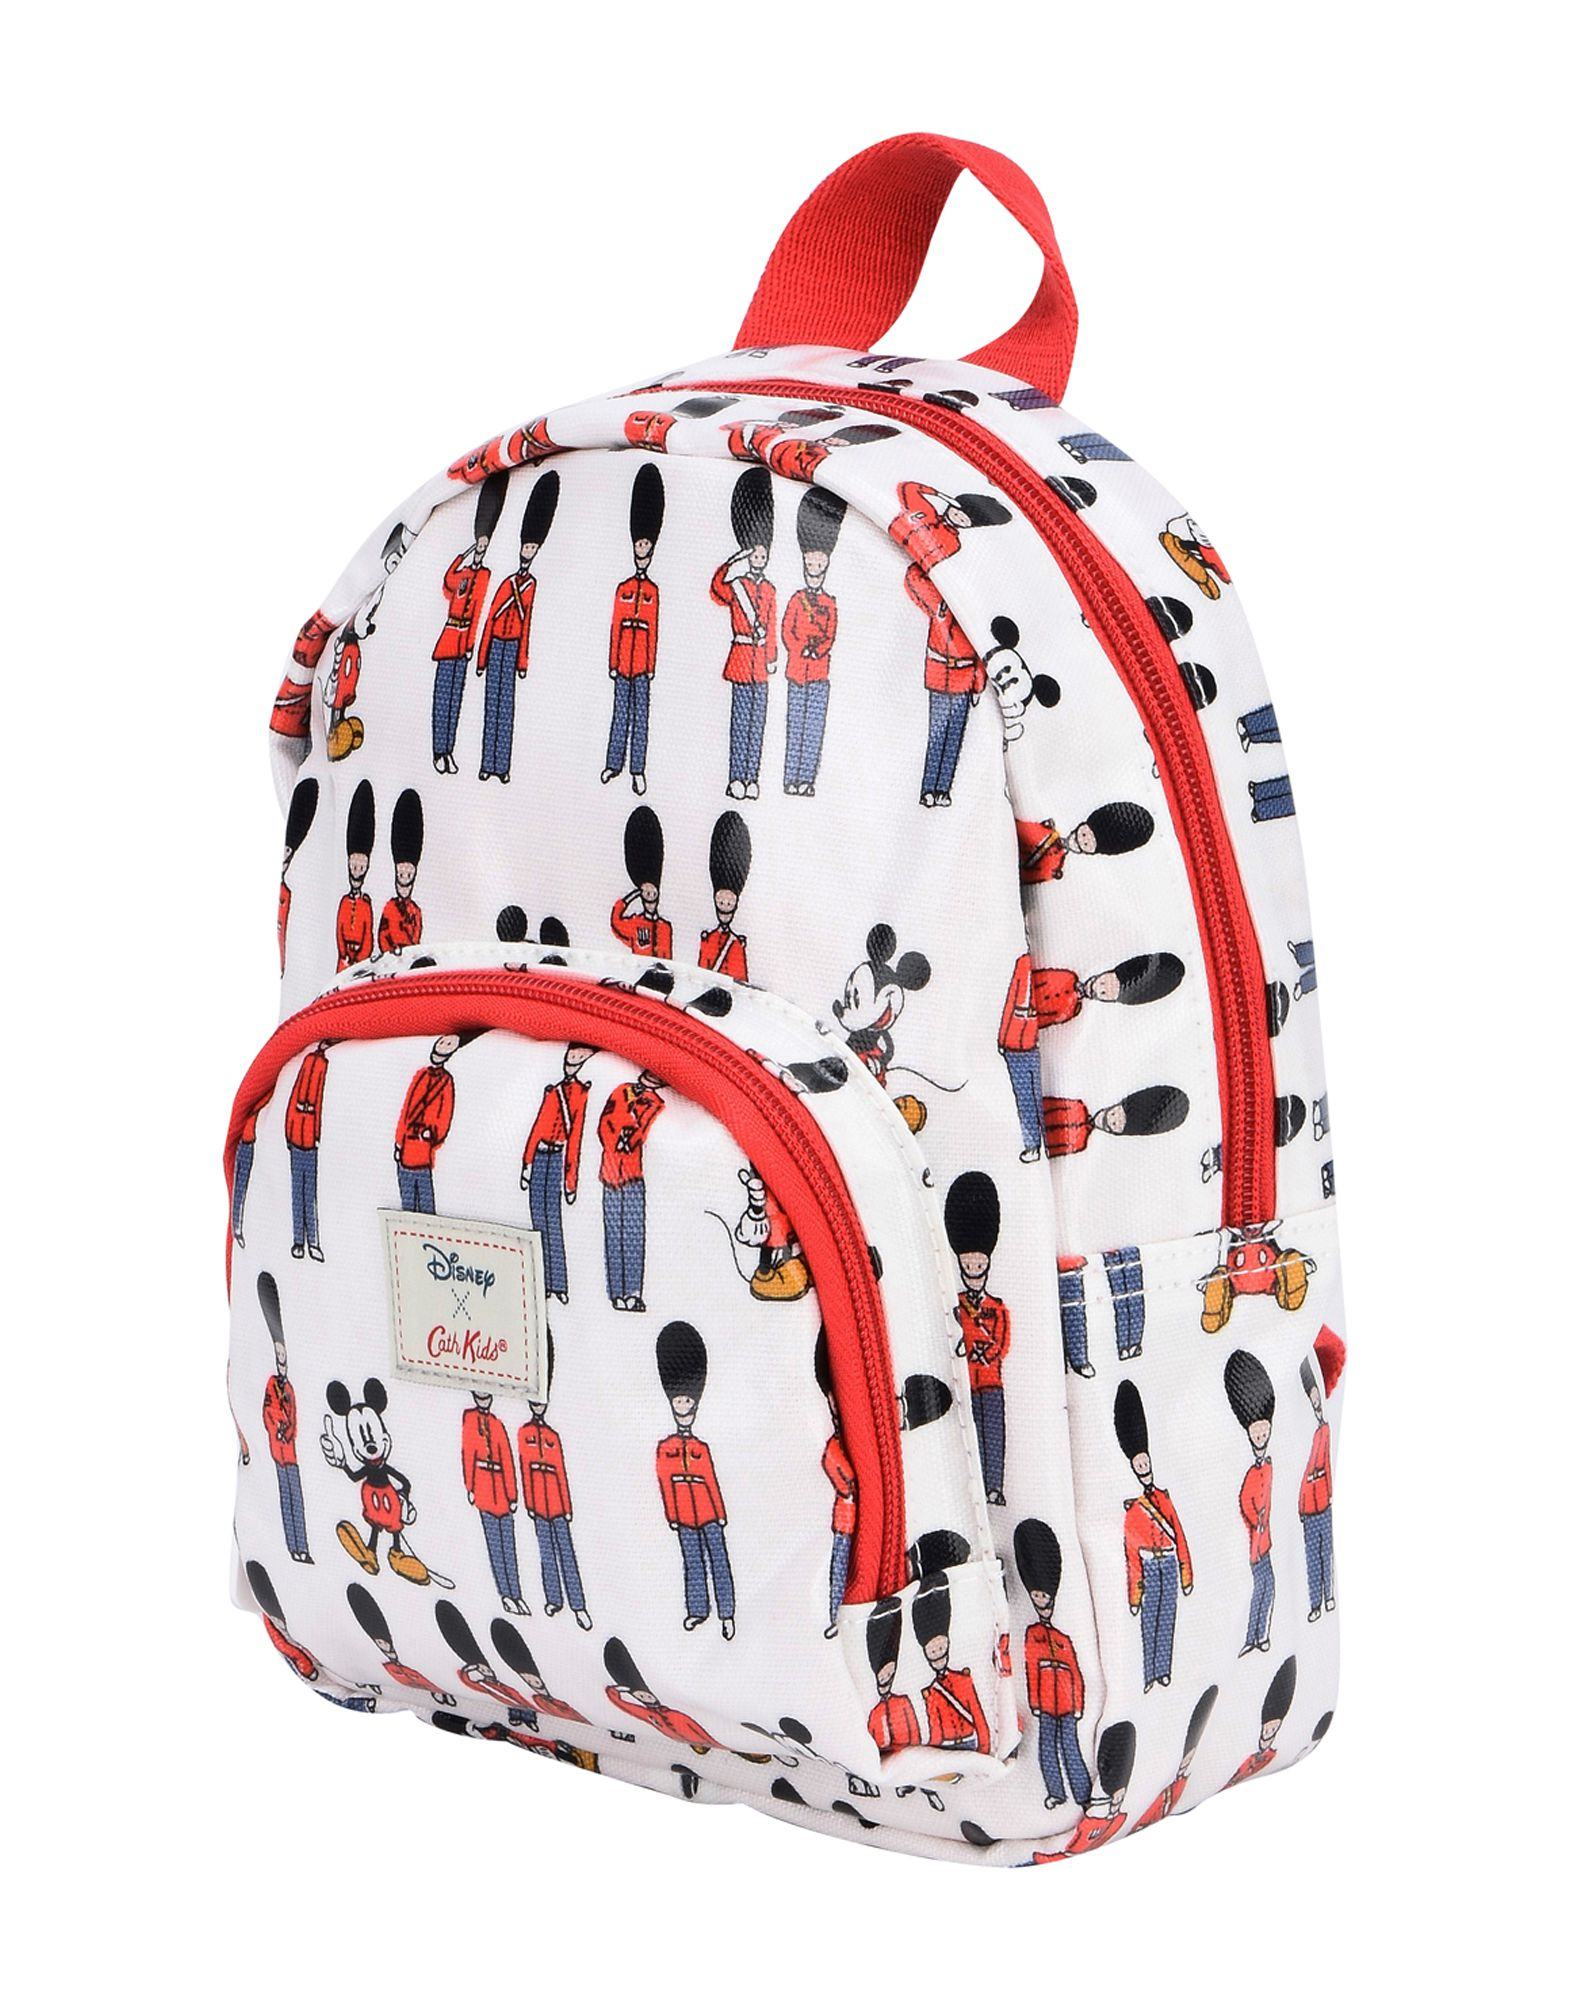 CATH KIDSTON x DISNEY Рюкзаки и сумки на пояс cath kidston x disney beauty case